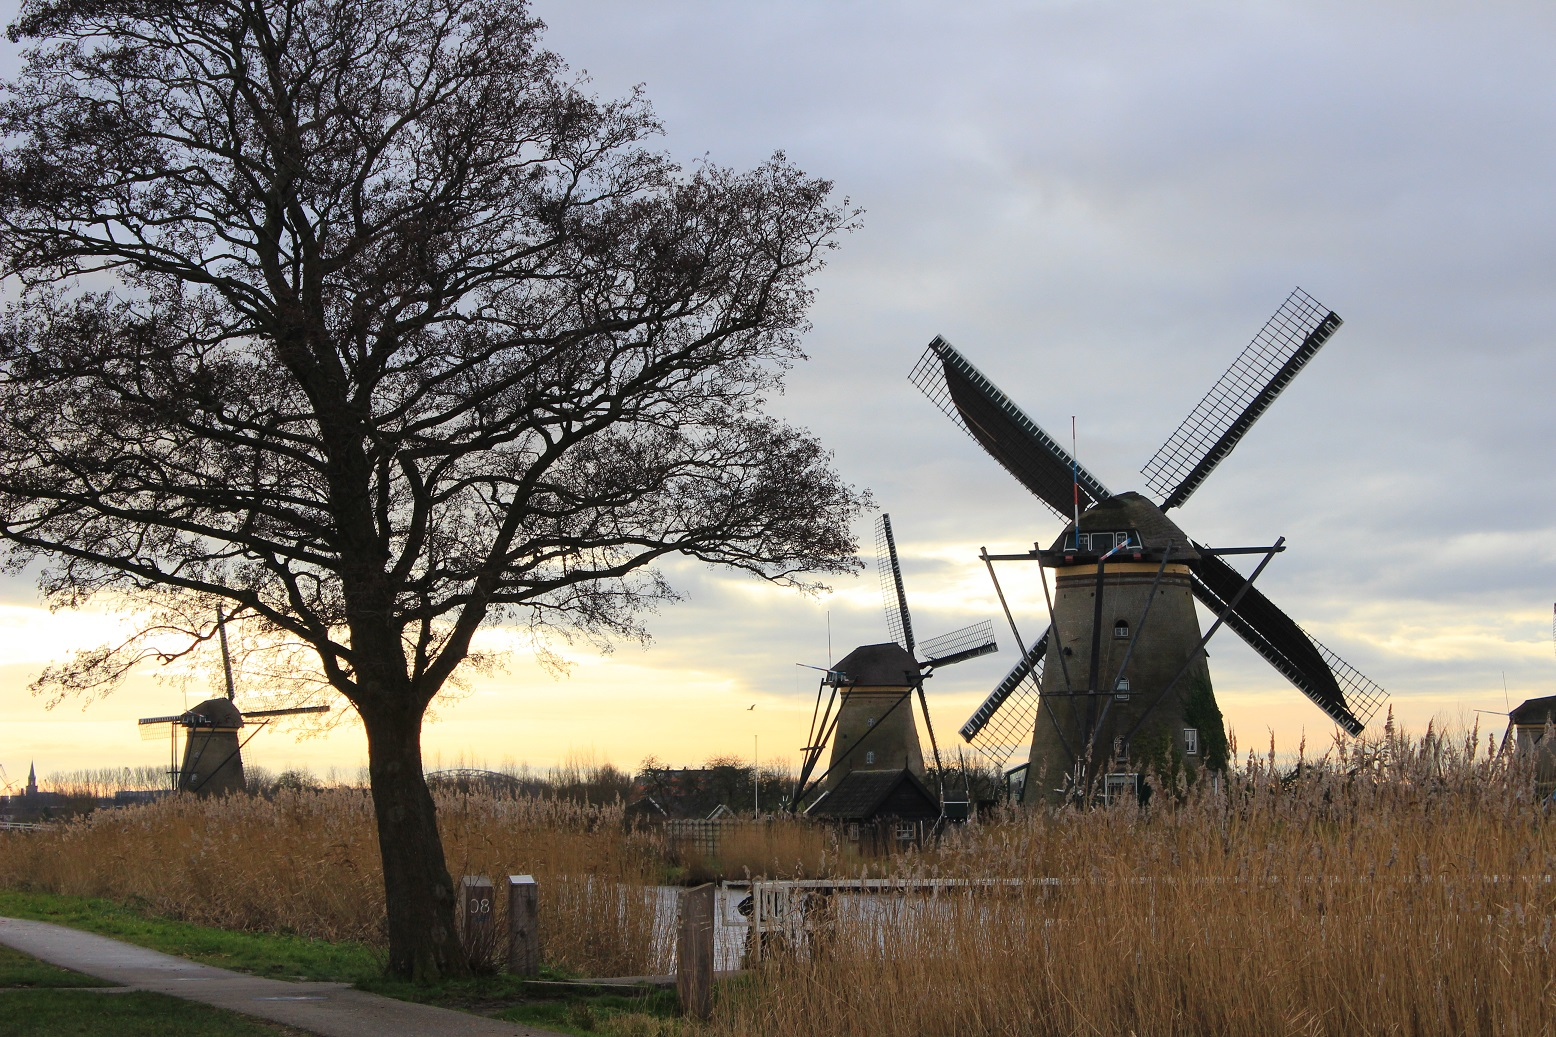 Kinderdijk, Windmühlen, Andreas Kocher